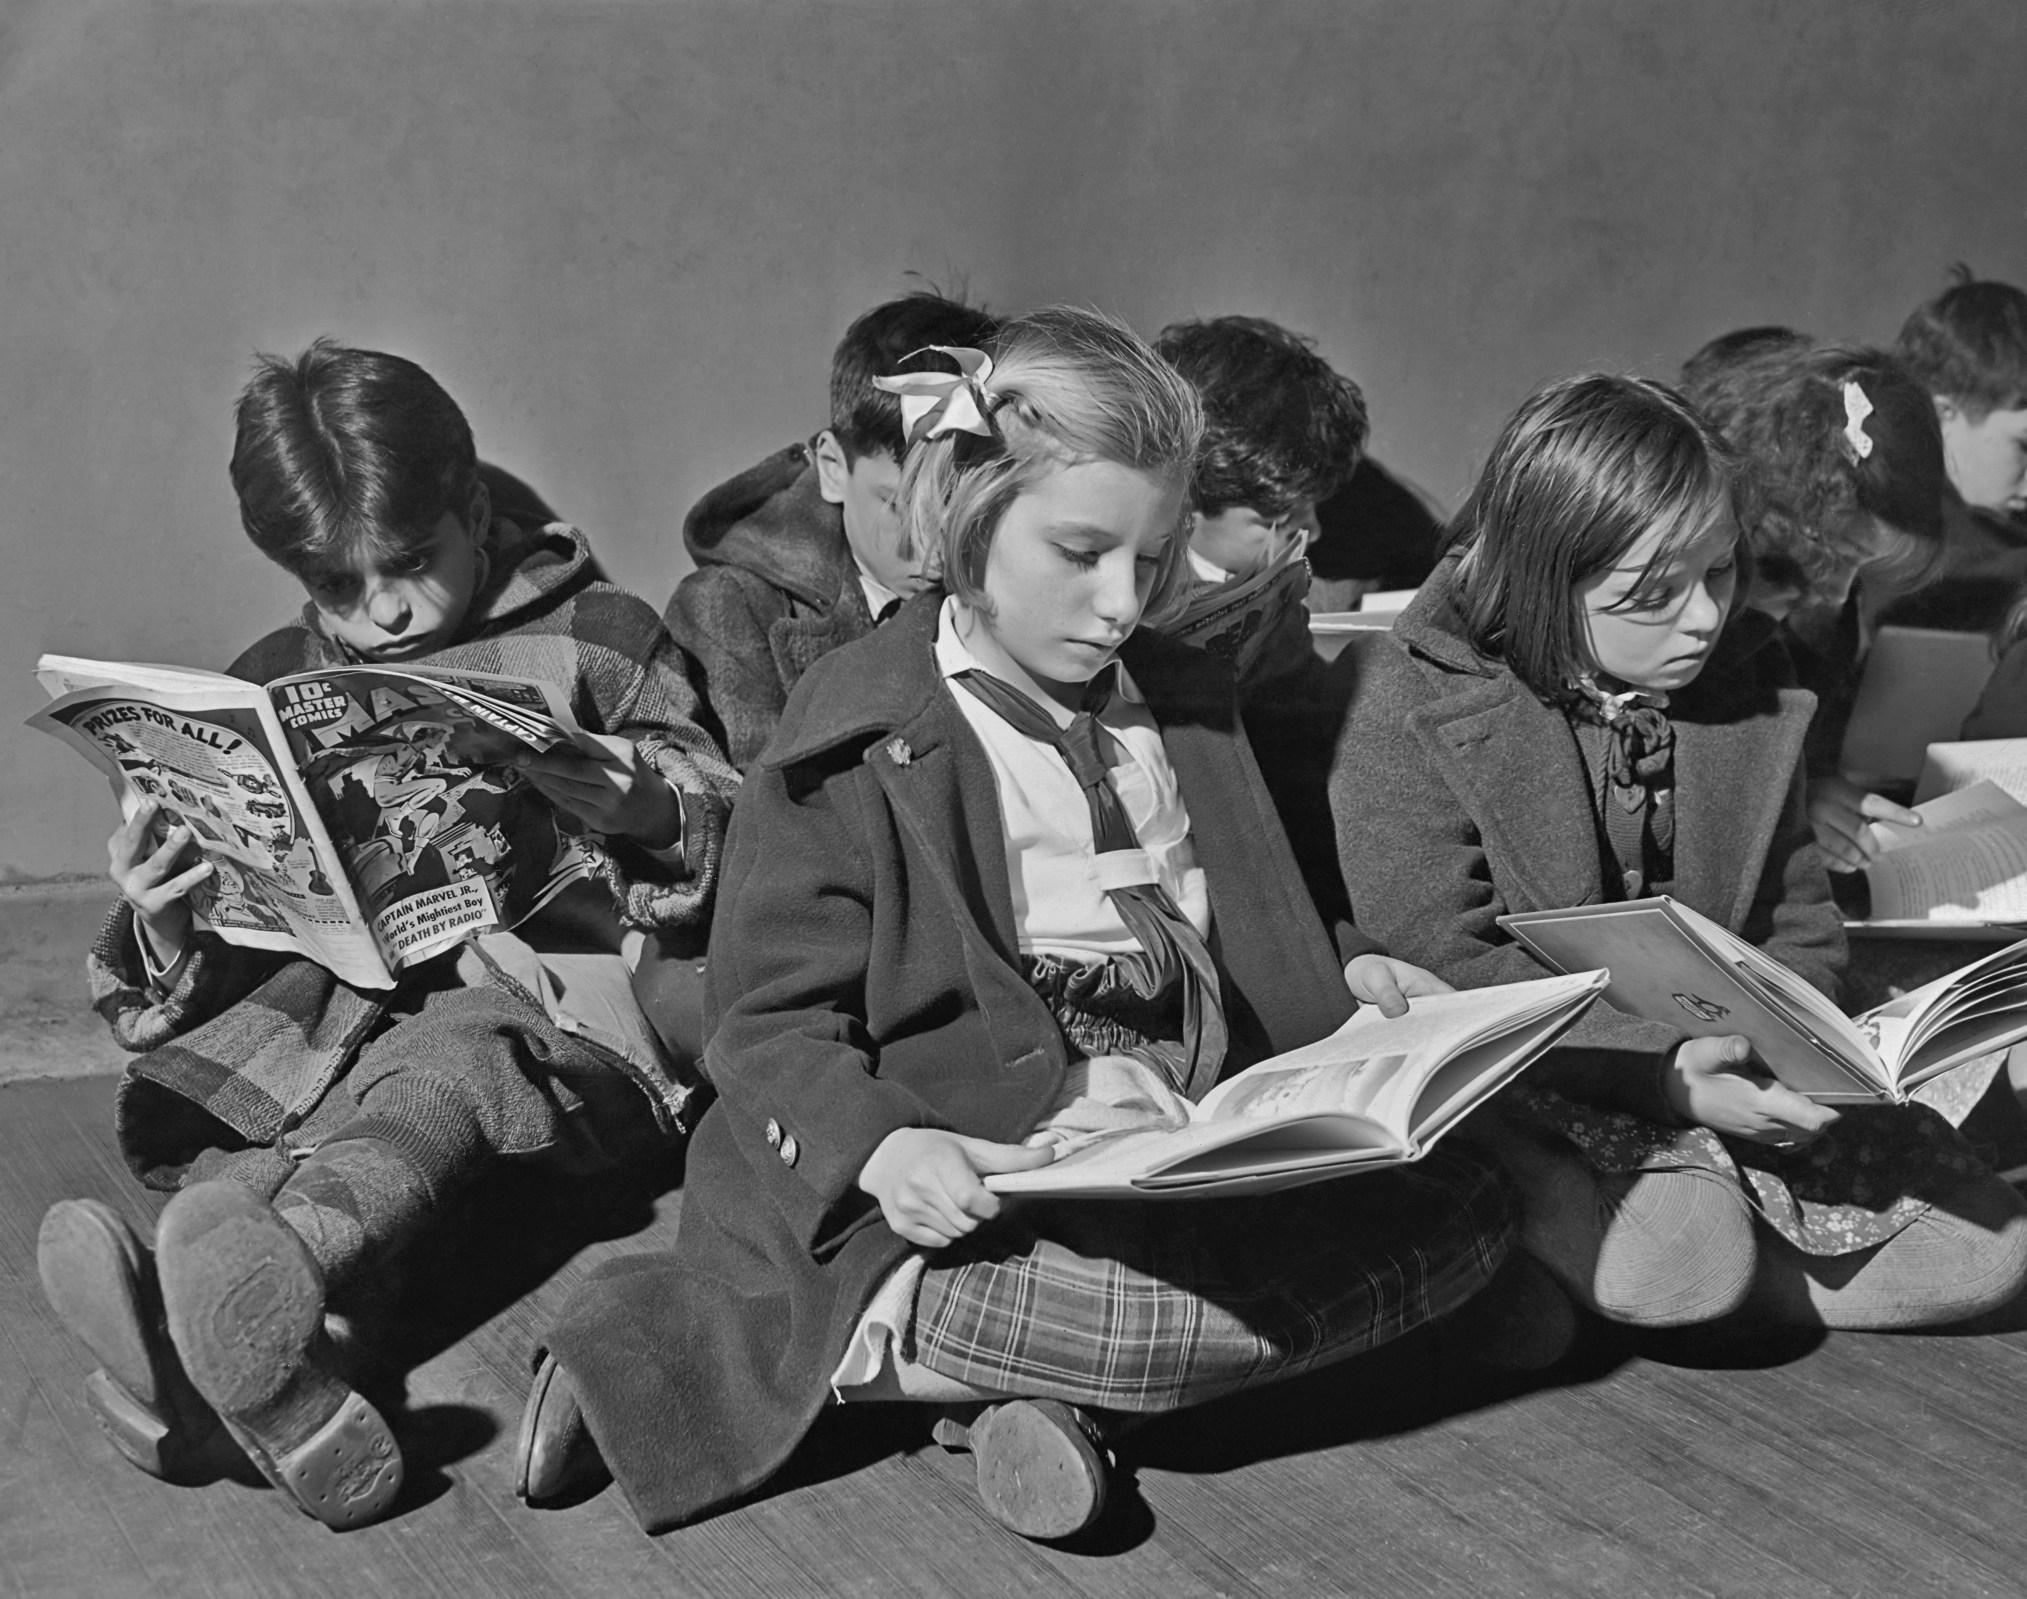 Children read books and comics in 1942.